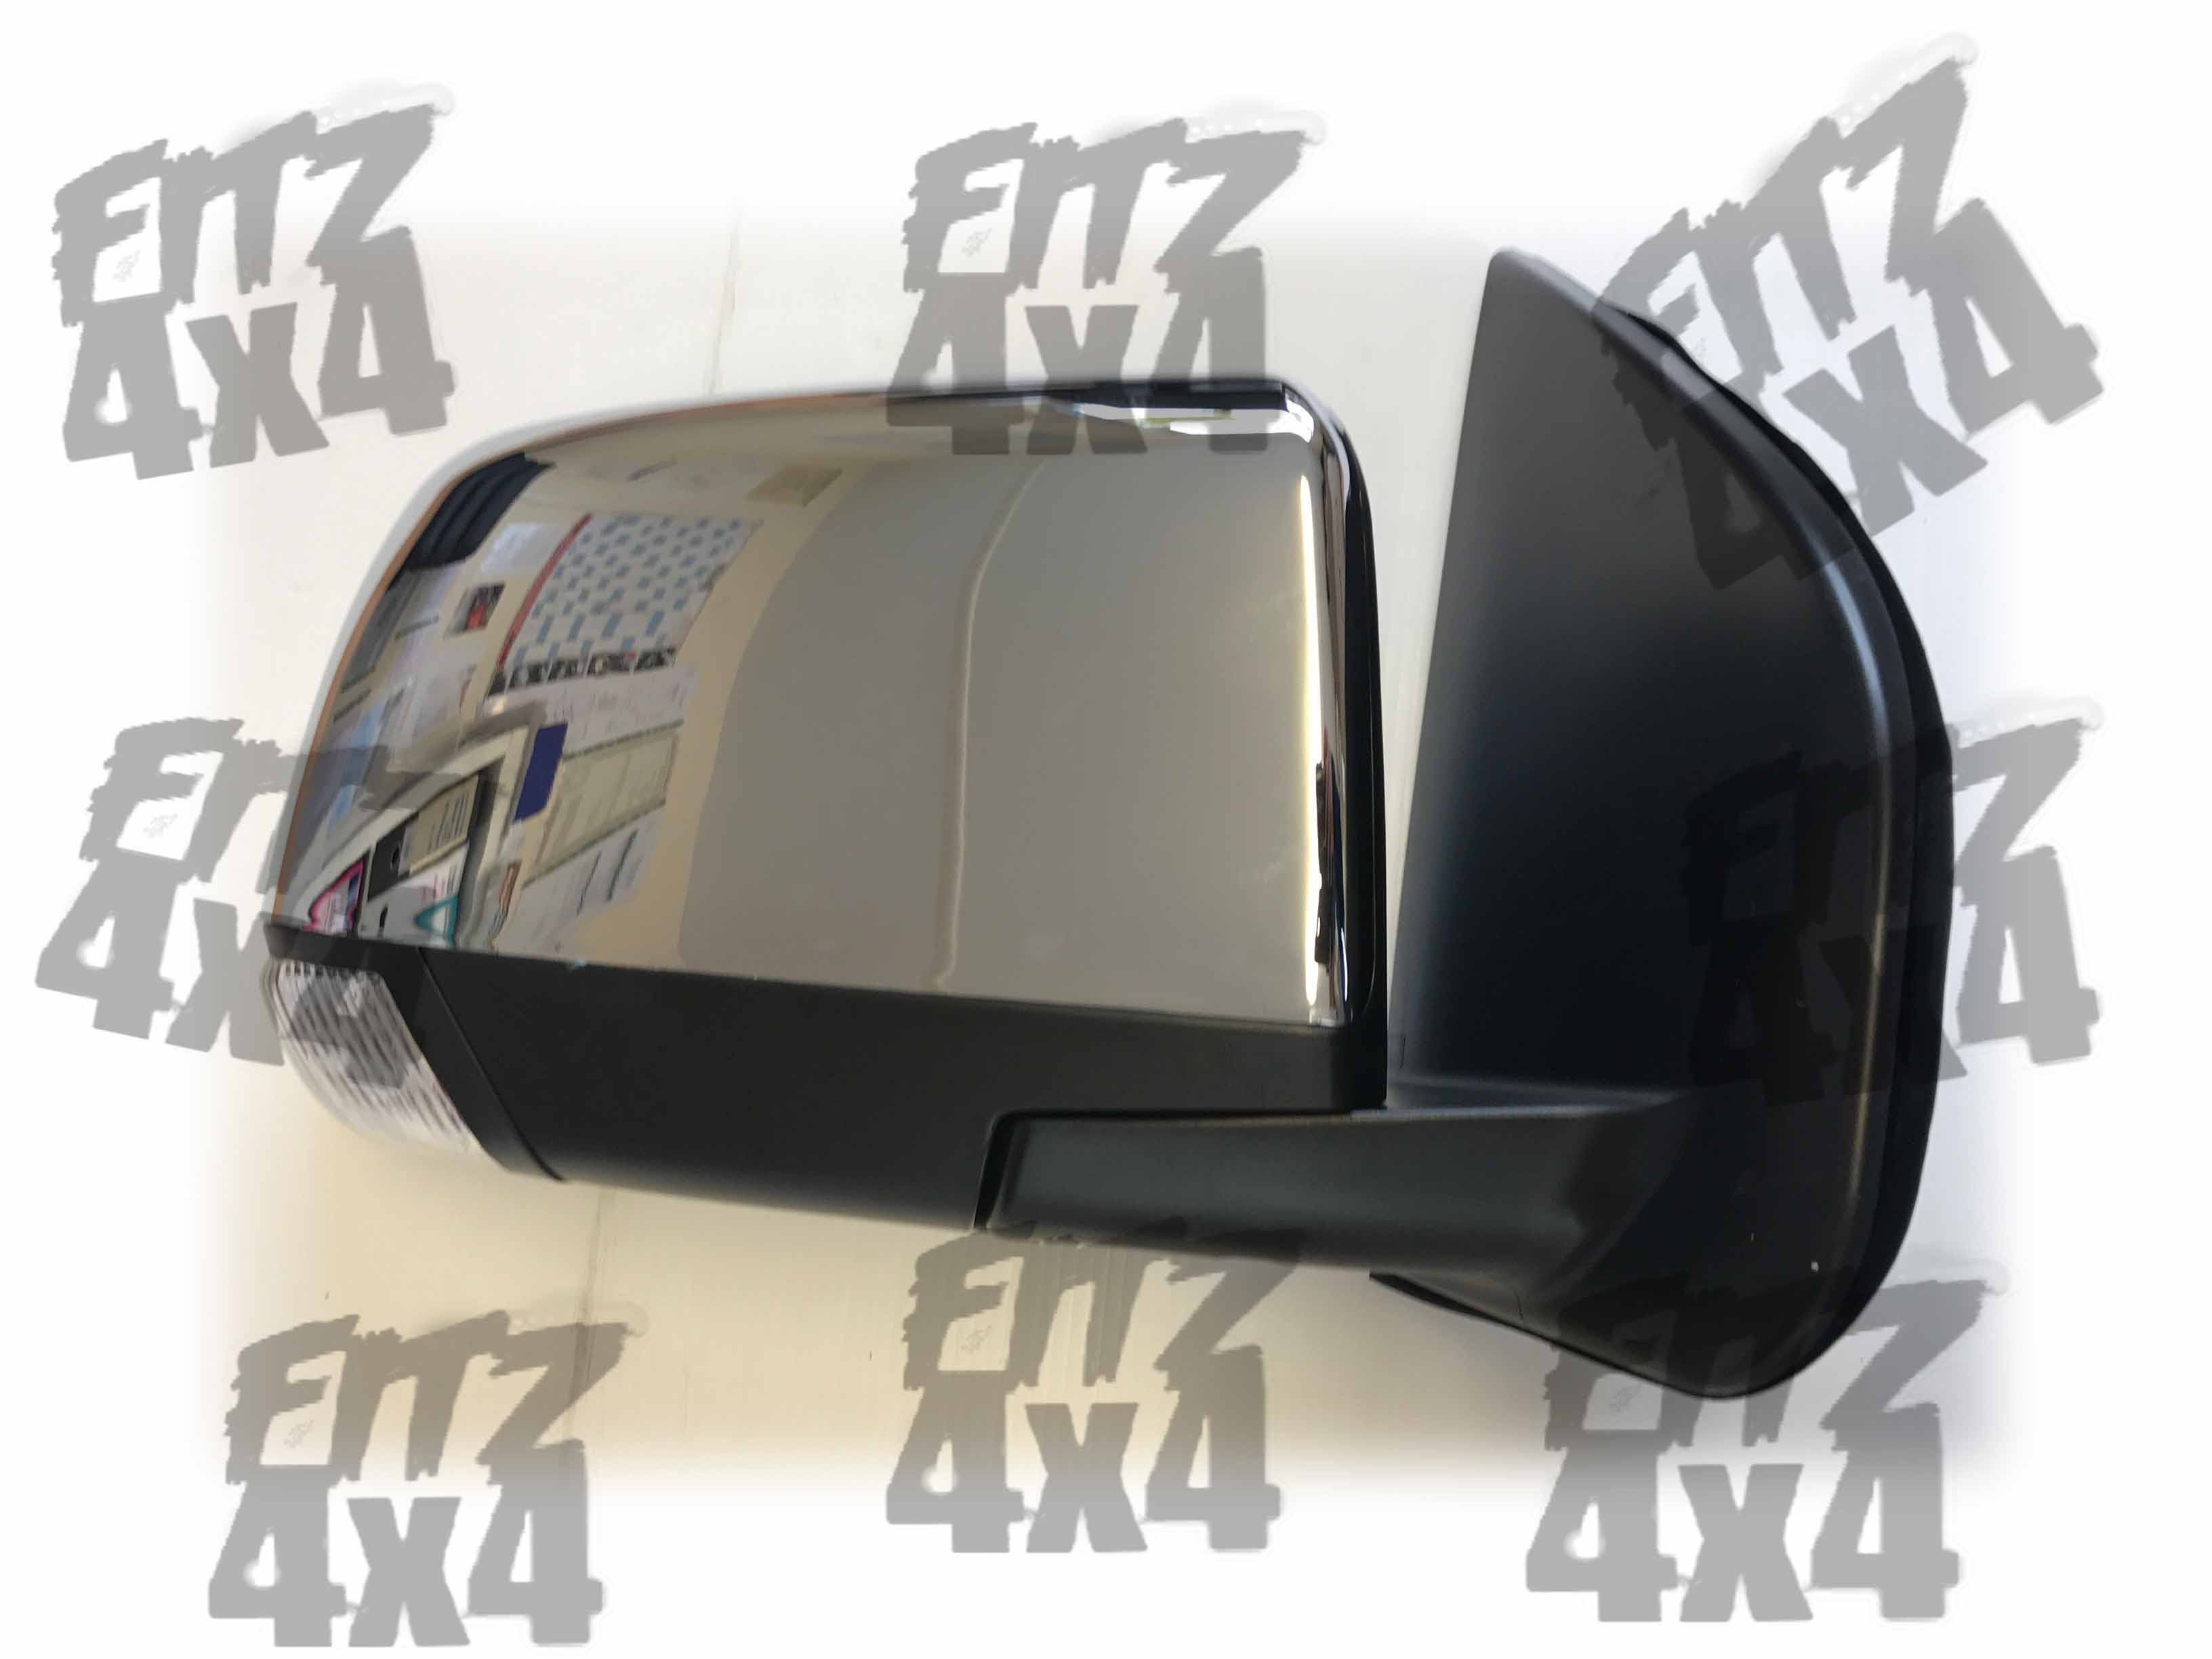 Isuzu D-Max Front Right Chrome Mirror